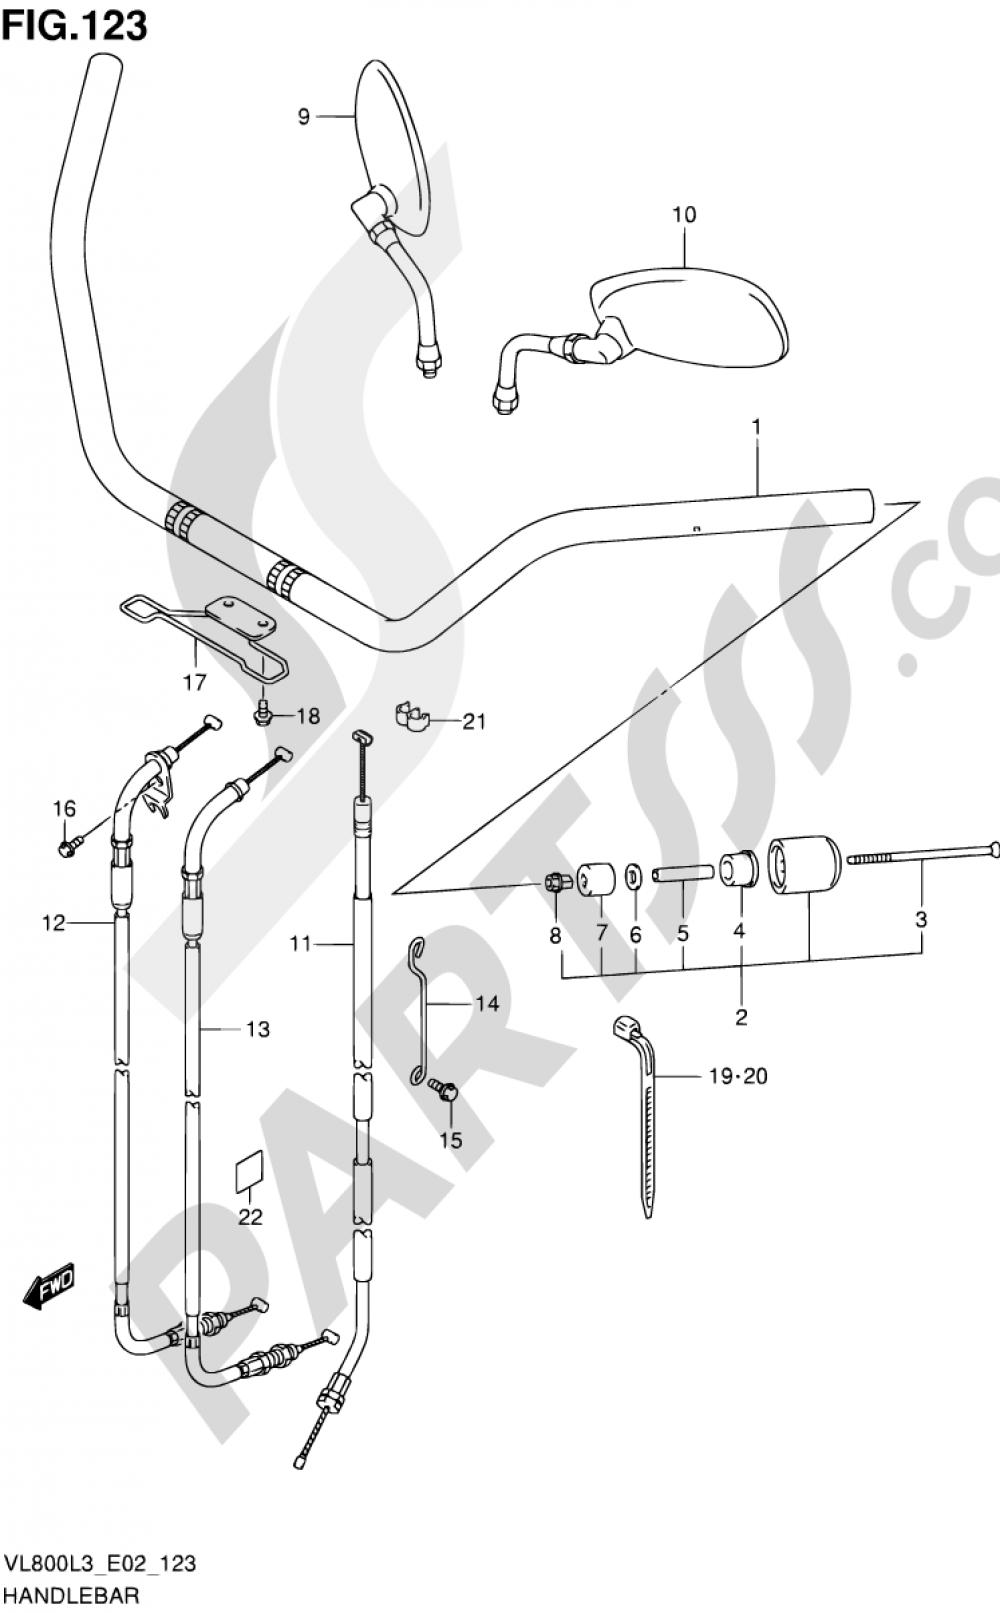 123 - HANDLEBAR (VL800CUEL3 E19) Suzuki INTRUDER VL800 2013